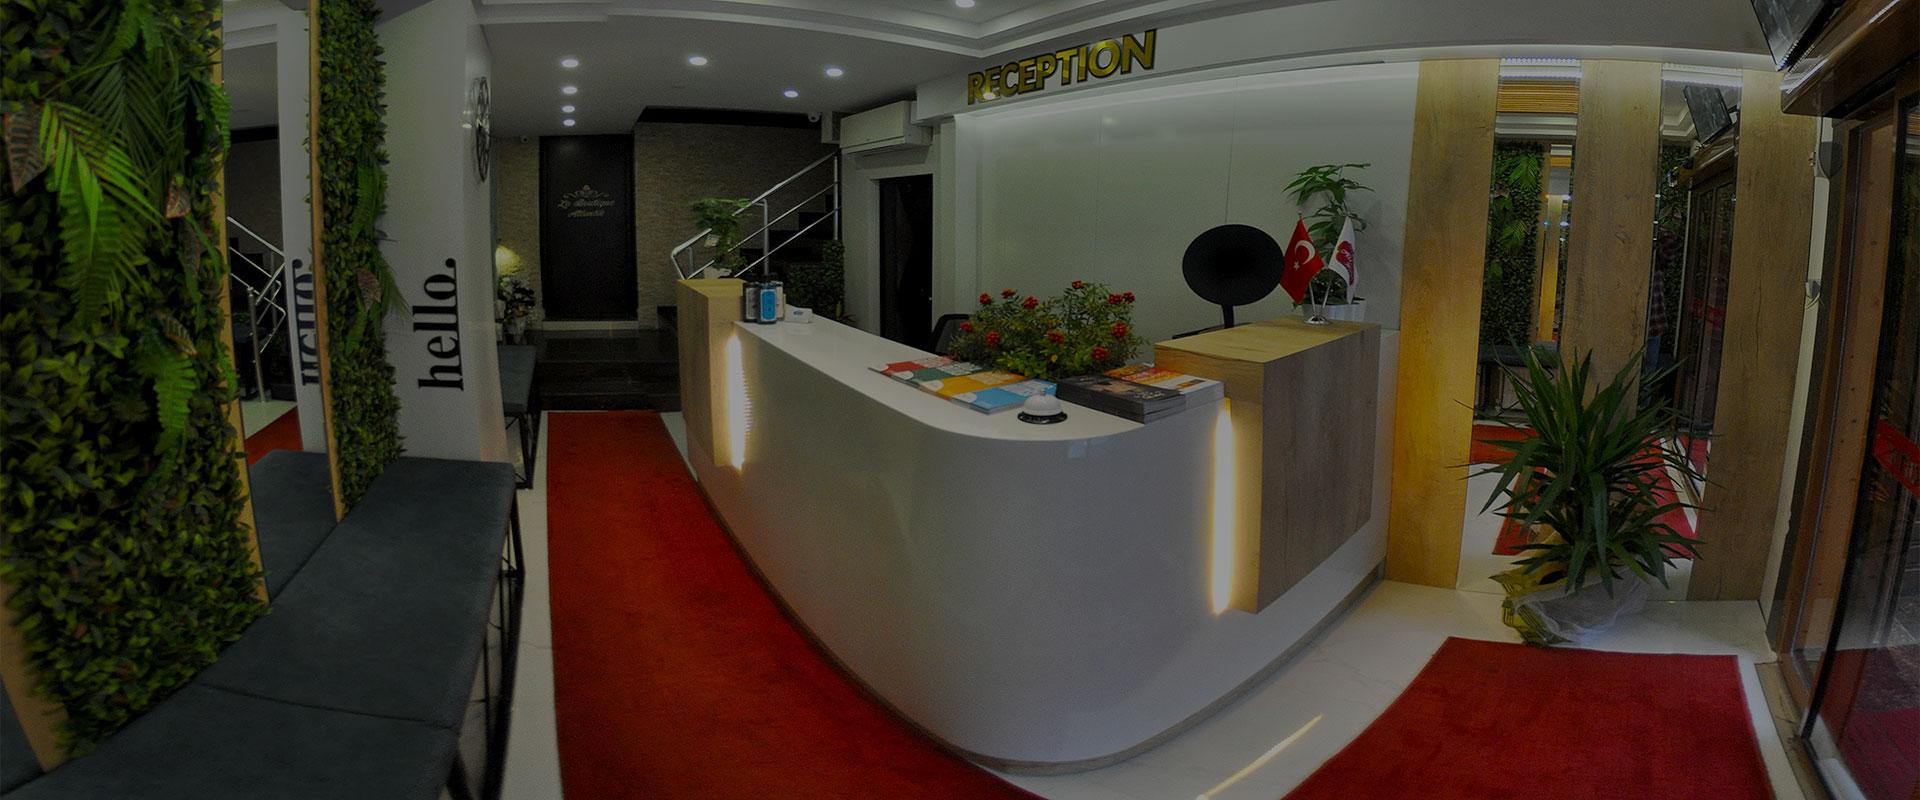 La Boutique Atlantik Hotel - Tekirdağ